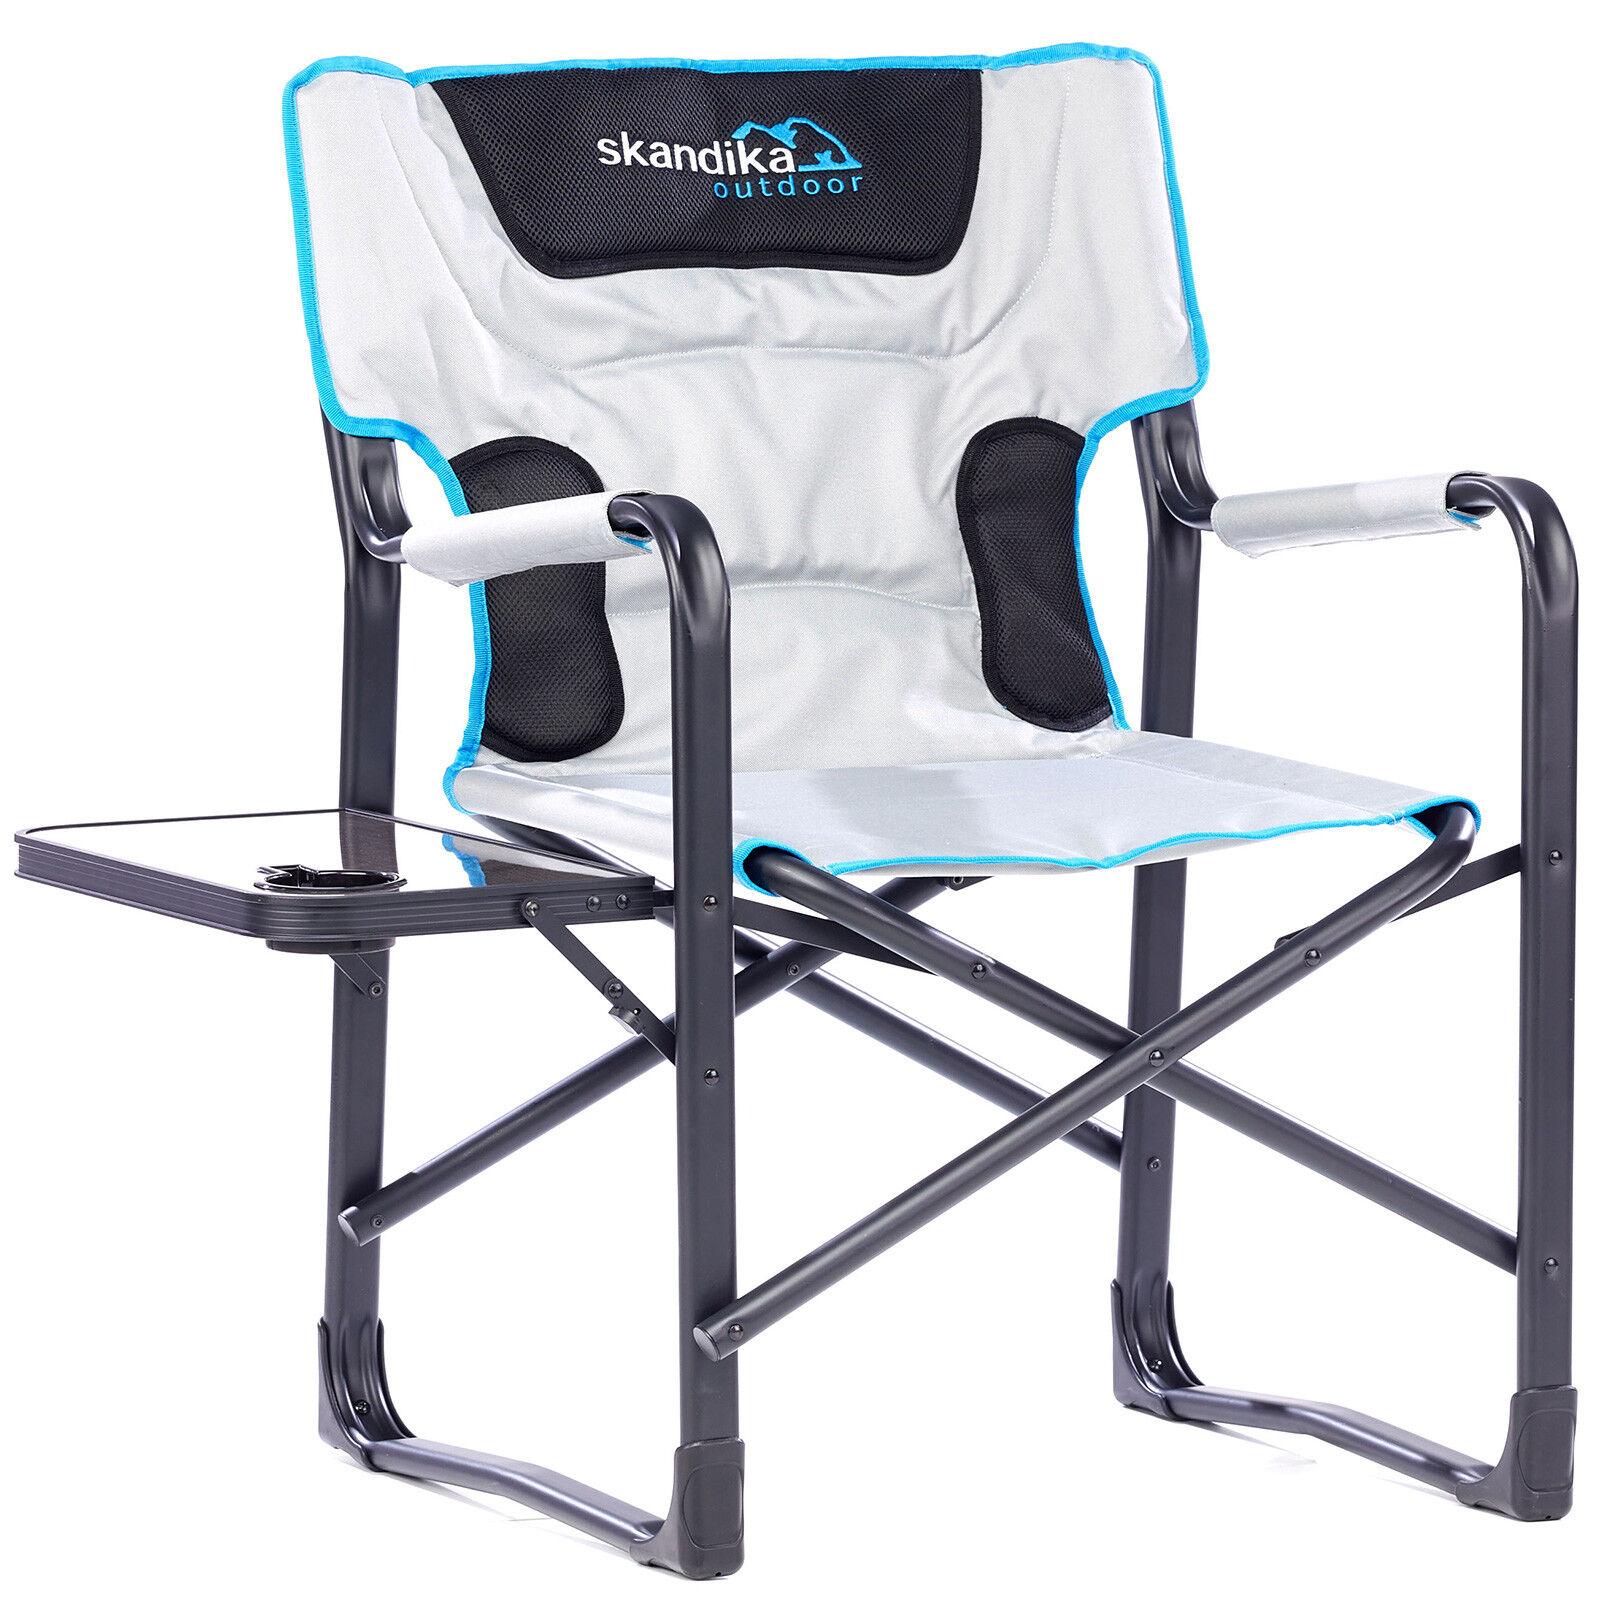 Skandika Siège Chaise Deluxe De Camping Pliable avec tablette Max 150Kg NEUF